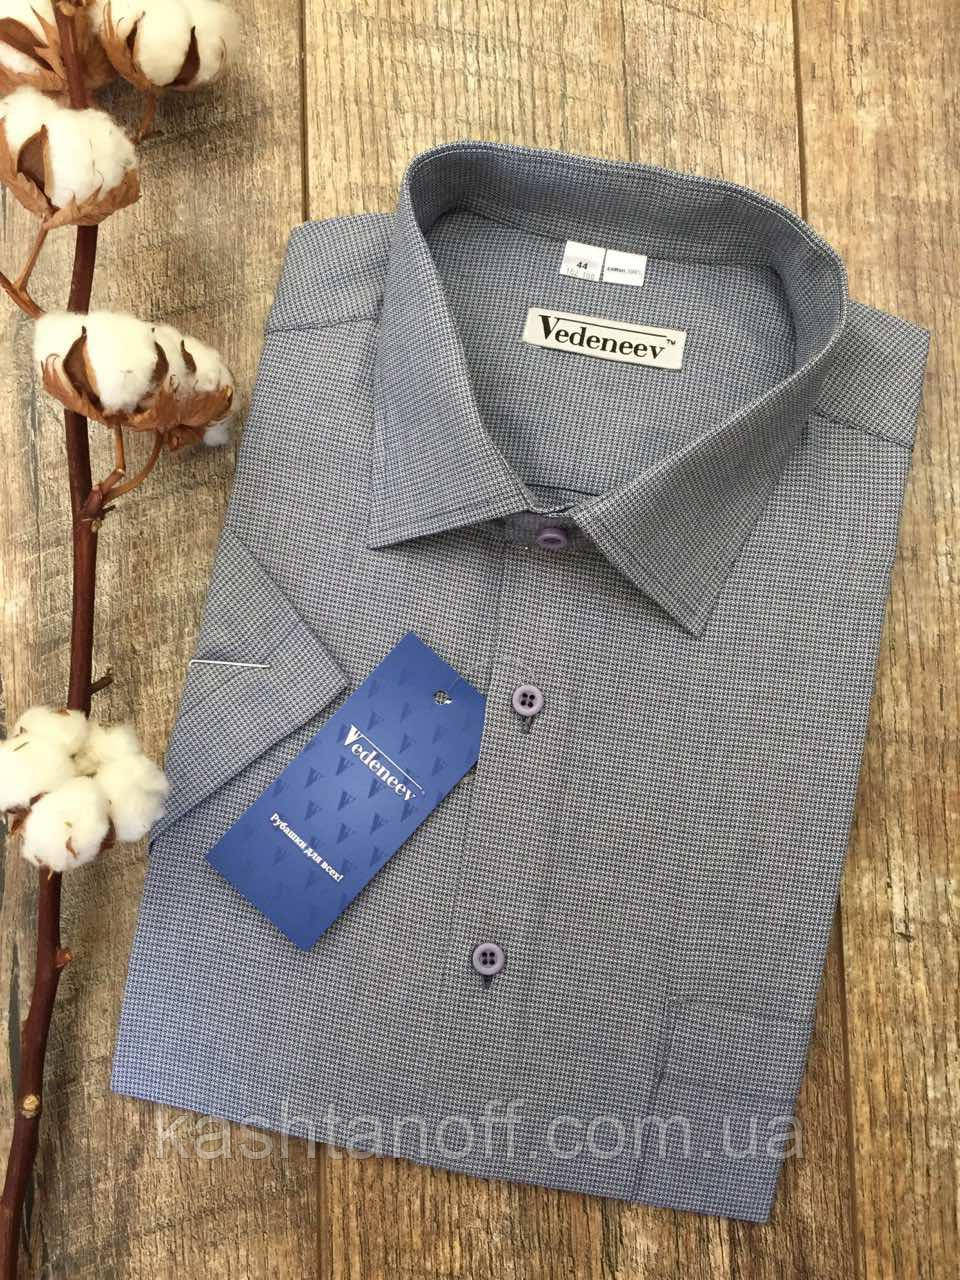 Мужская рубашка с коротким рукавом меланж джинс